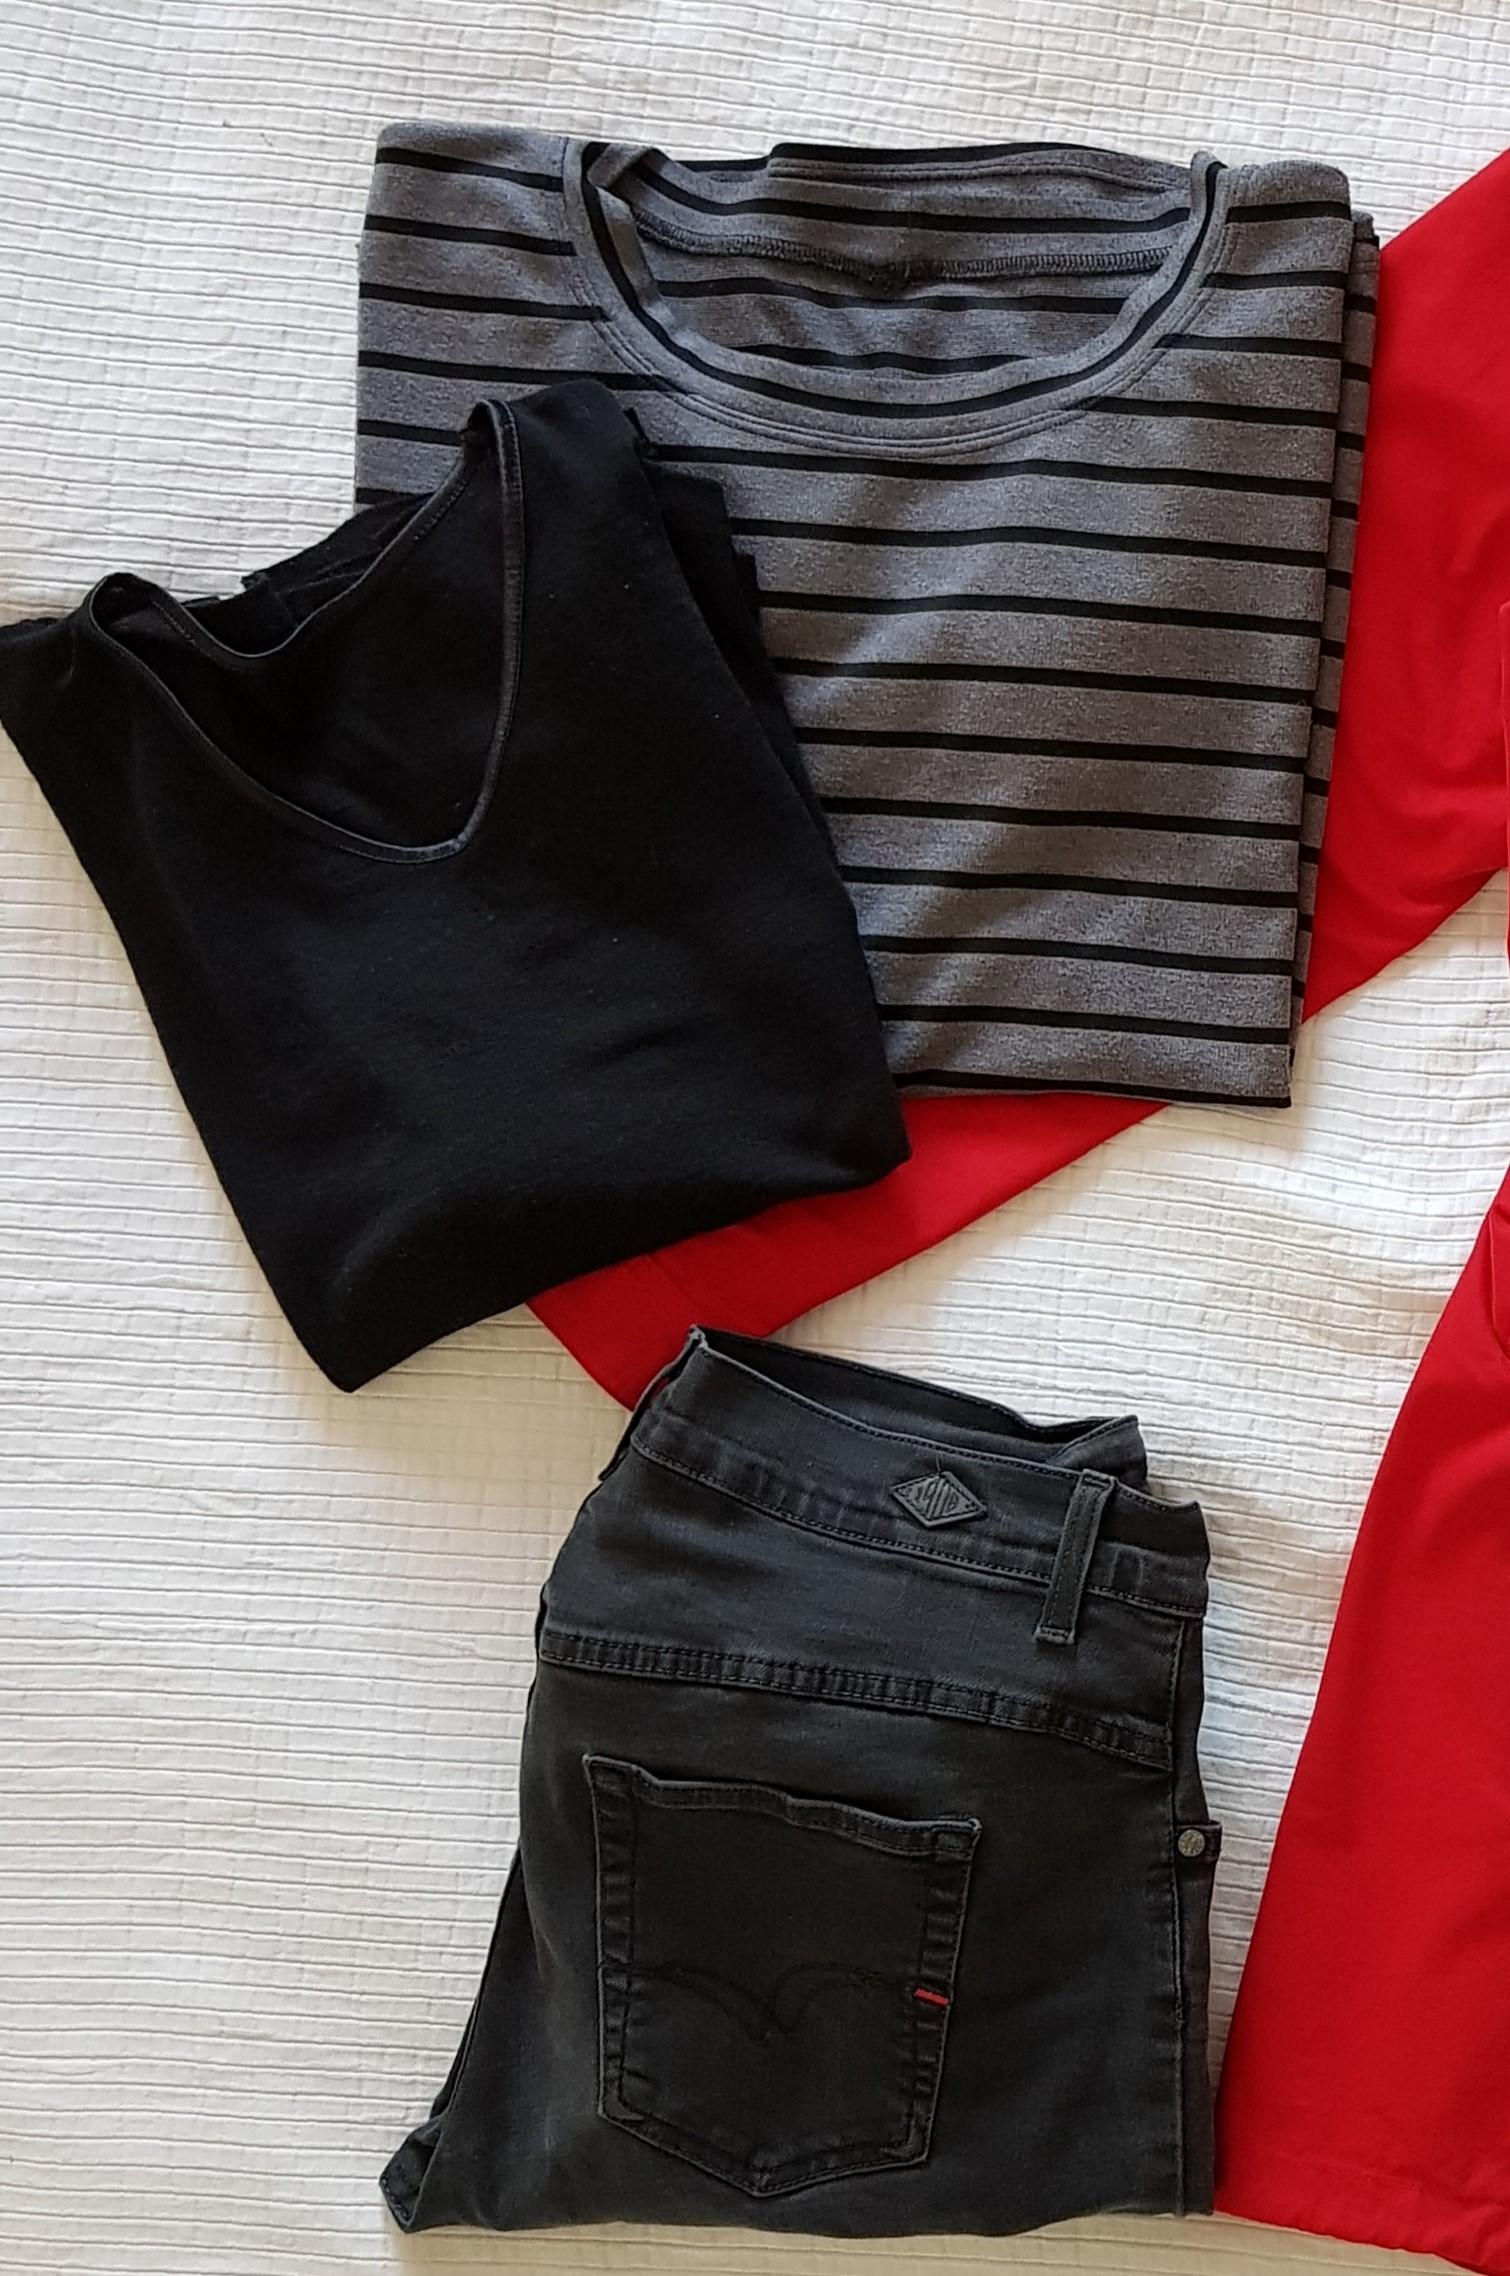 dressing for fall weather 5 merino wool undershirt molly top black jeans.jpg